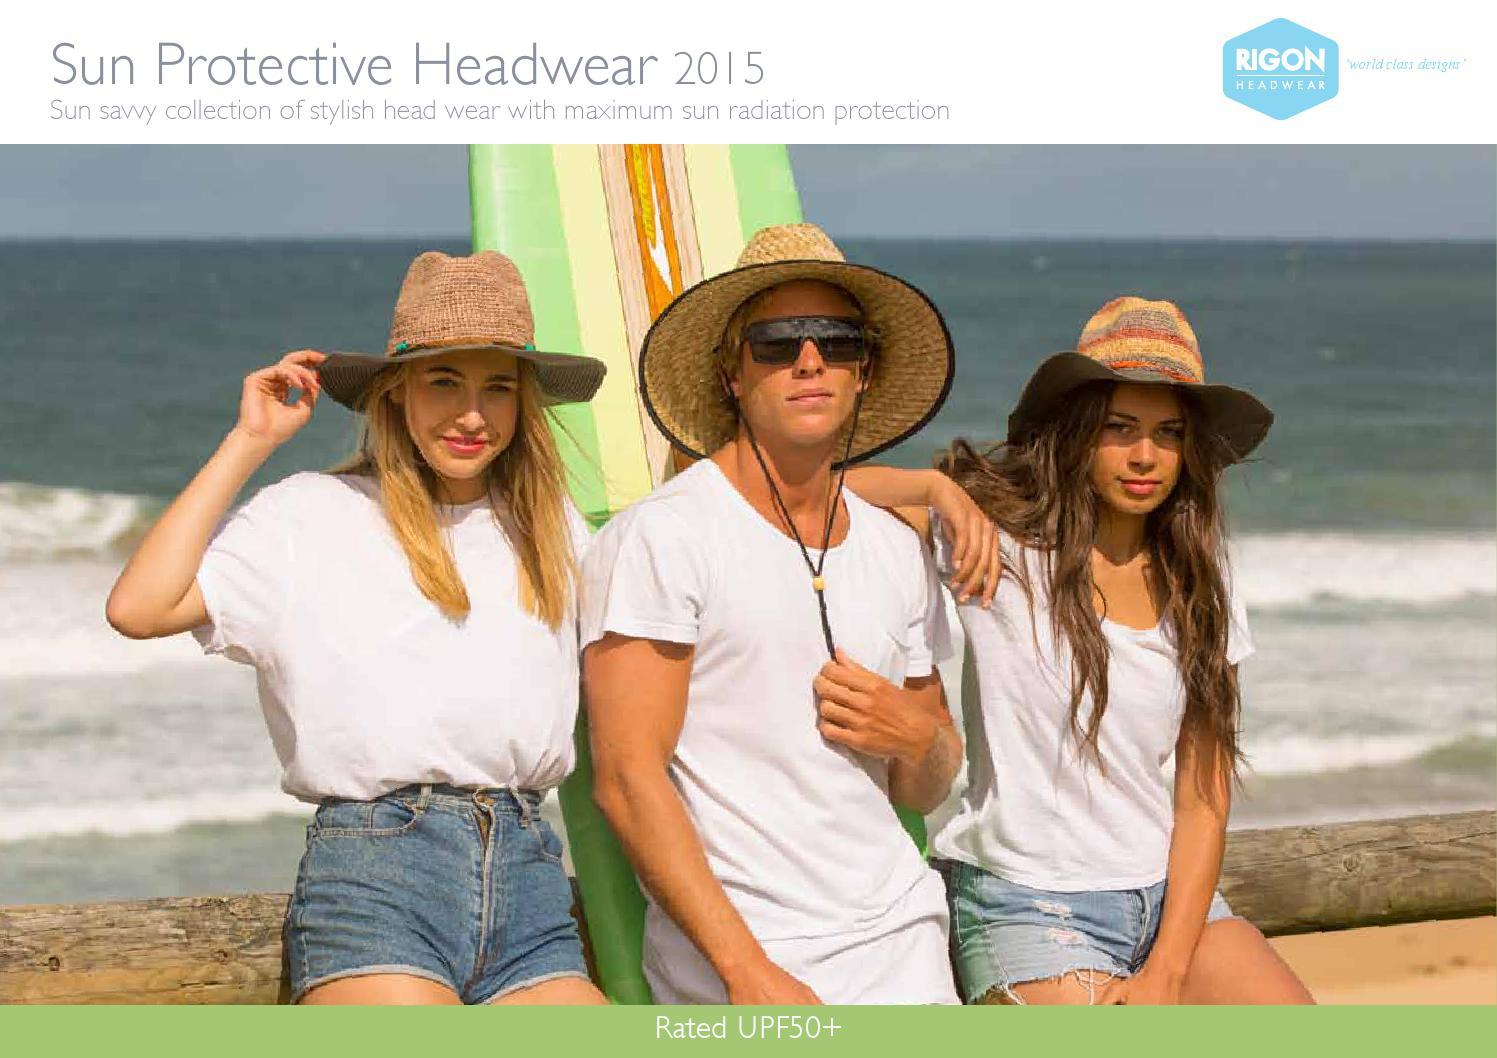 e003456beb5 Sun Protective Headwear 2015 by Rigon Headwear - issuu